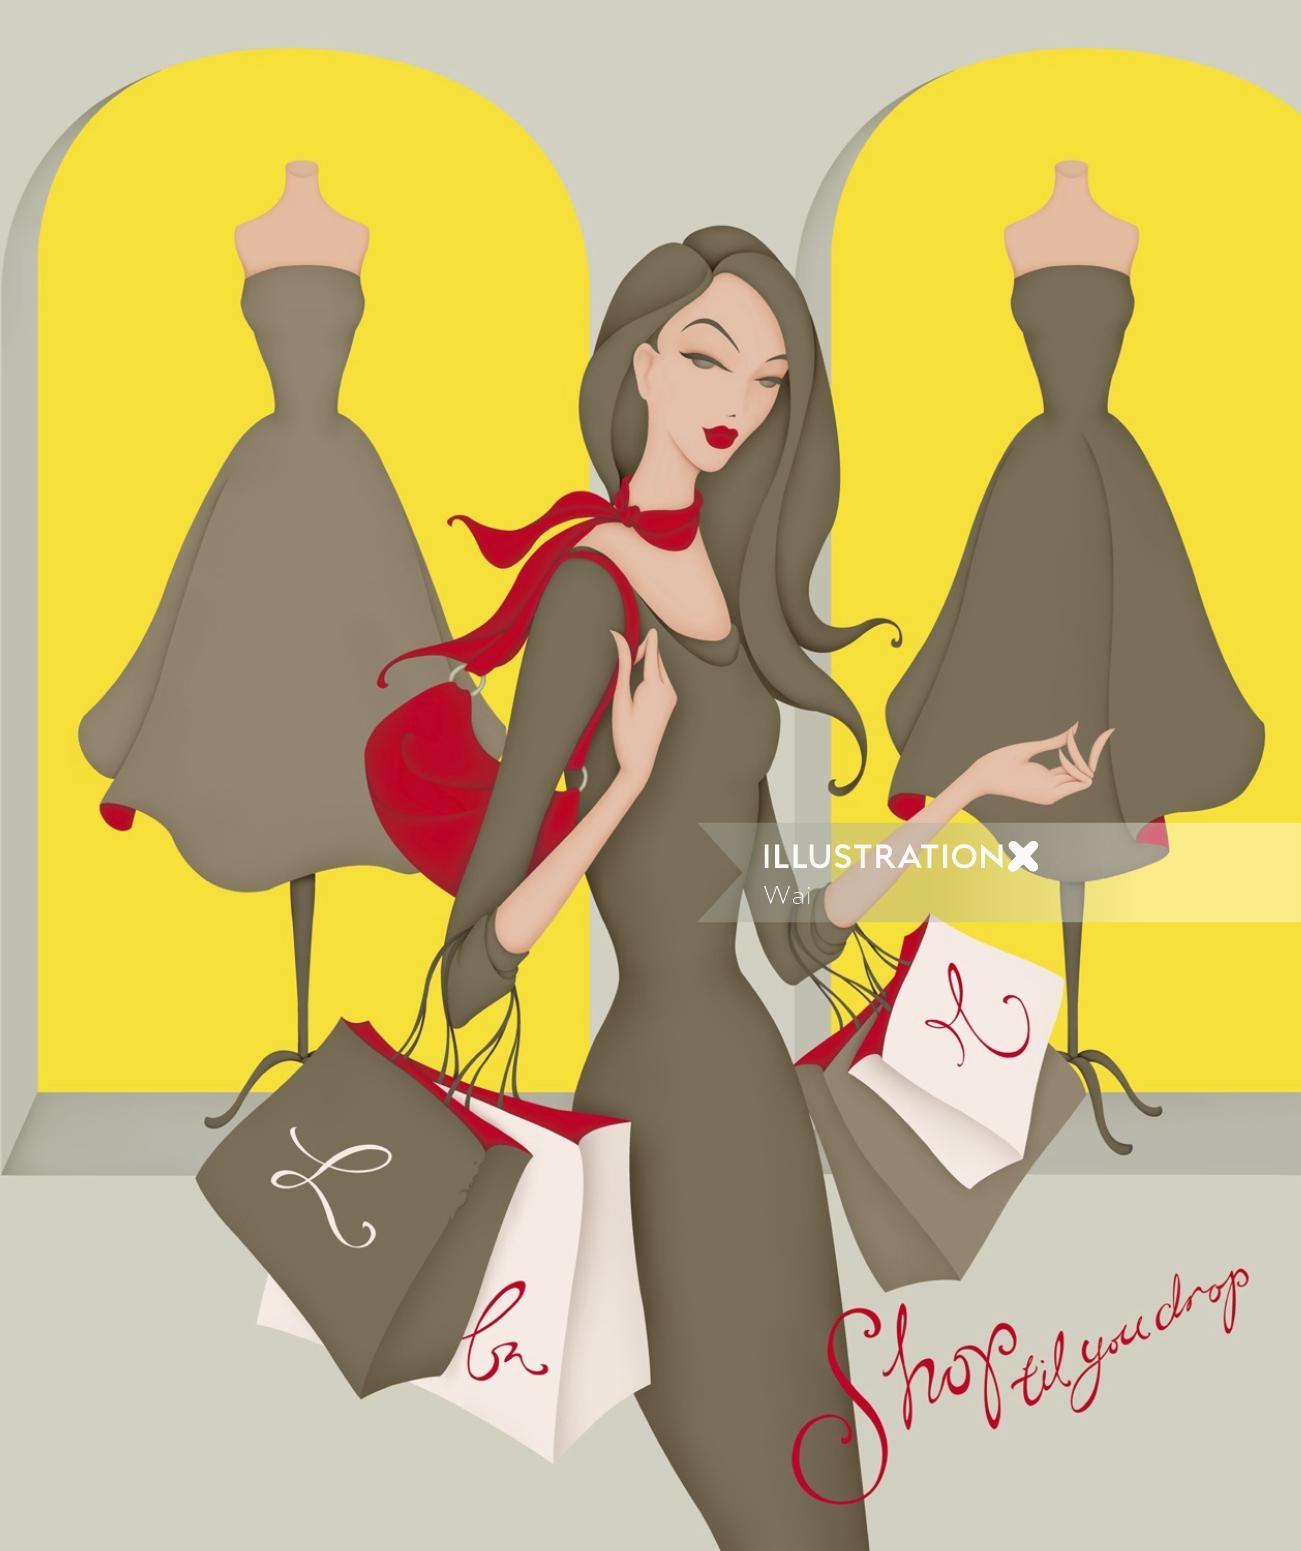 Illustration of women shopping, walking past shop windows, holding shopping bags